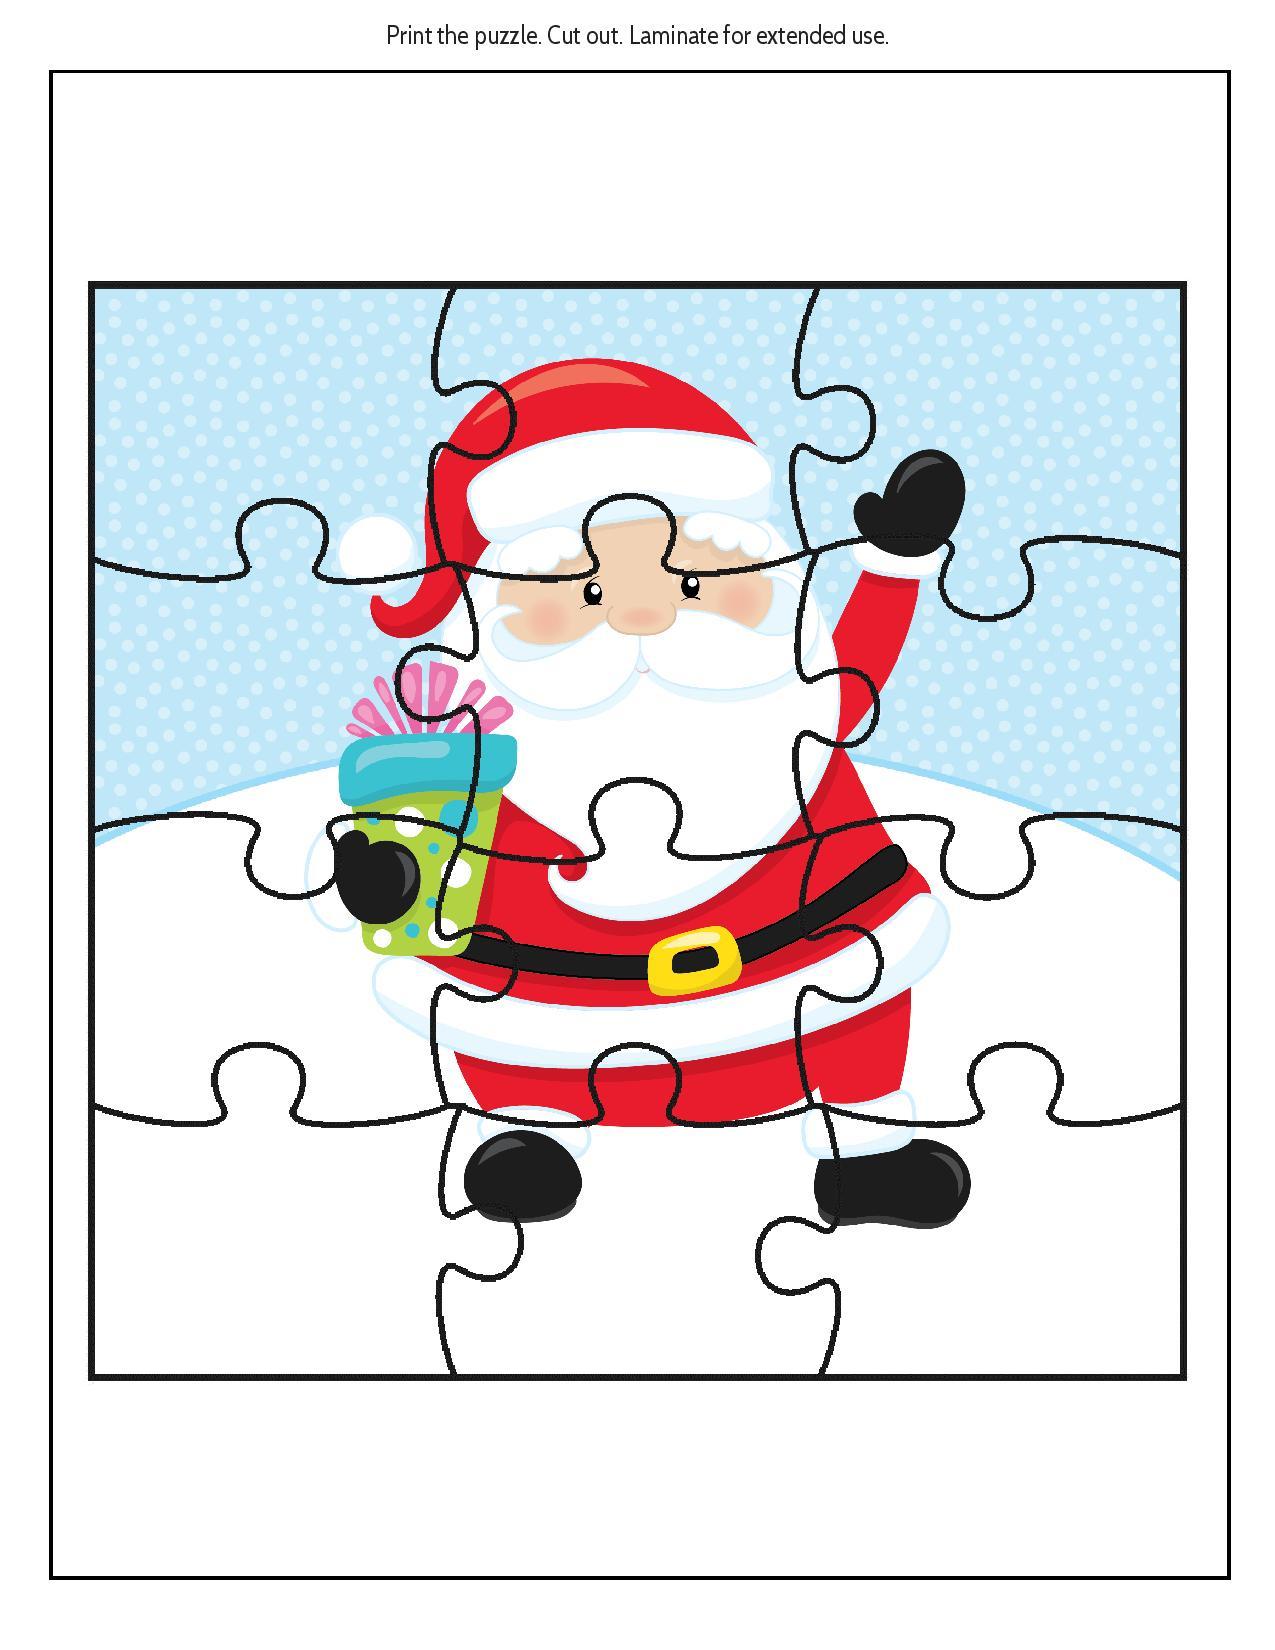 Free Educational Printable Christmas Puzzle Pack - Real And Quirky - Free Printable Christmas Puzzle Sheets